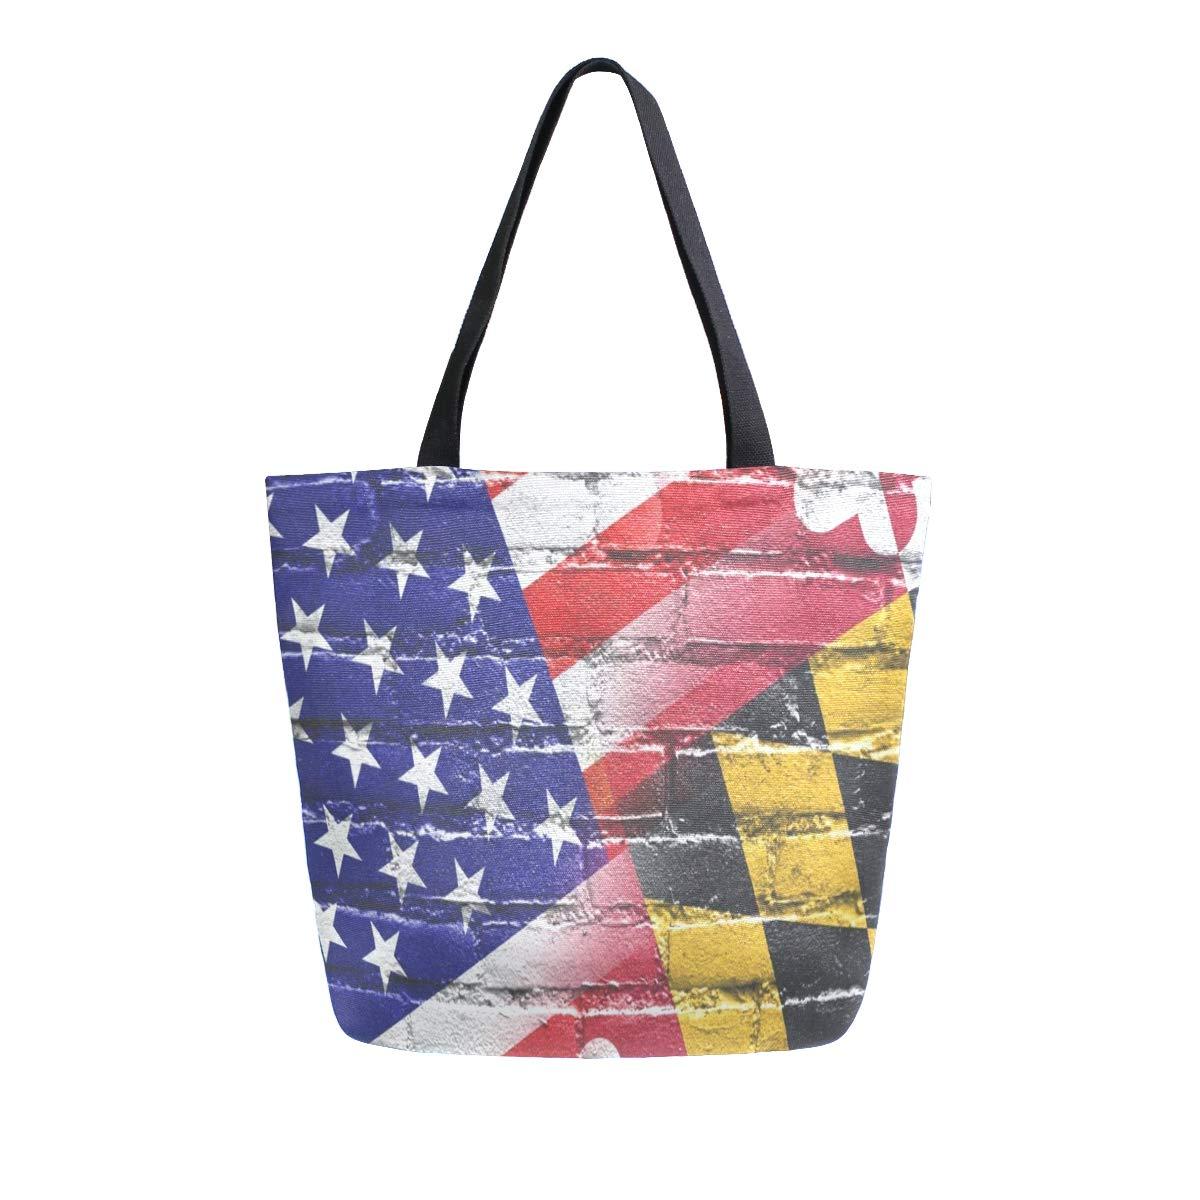 Maryland State Flag Travel Bag Cute Luggage Bags Duffle Bag Large Capacity Travel Organizer Bag